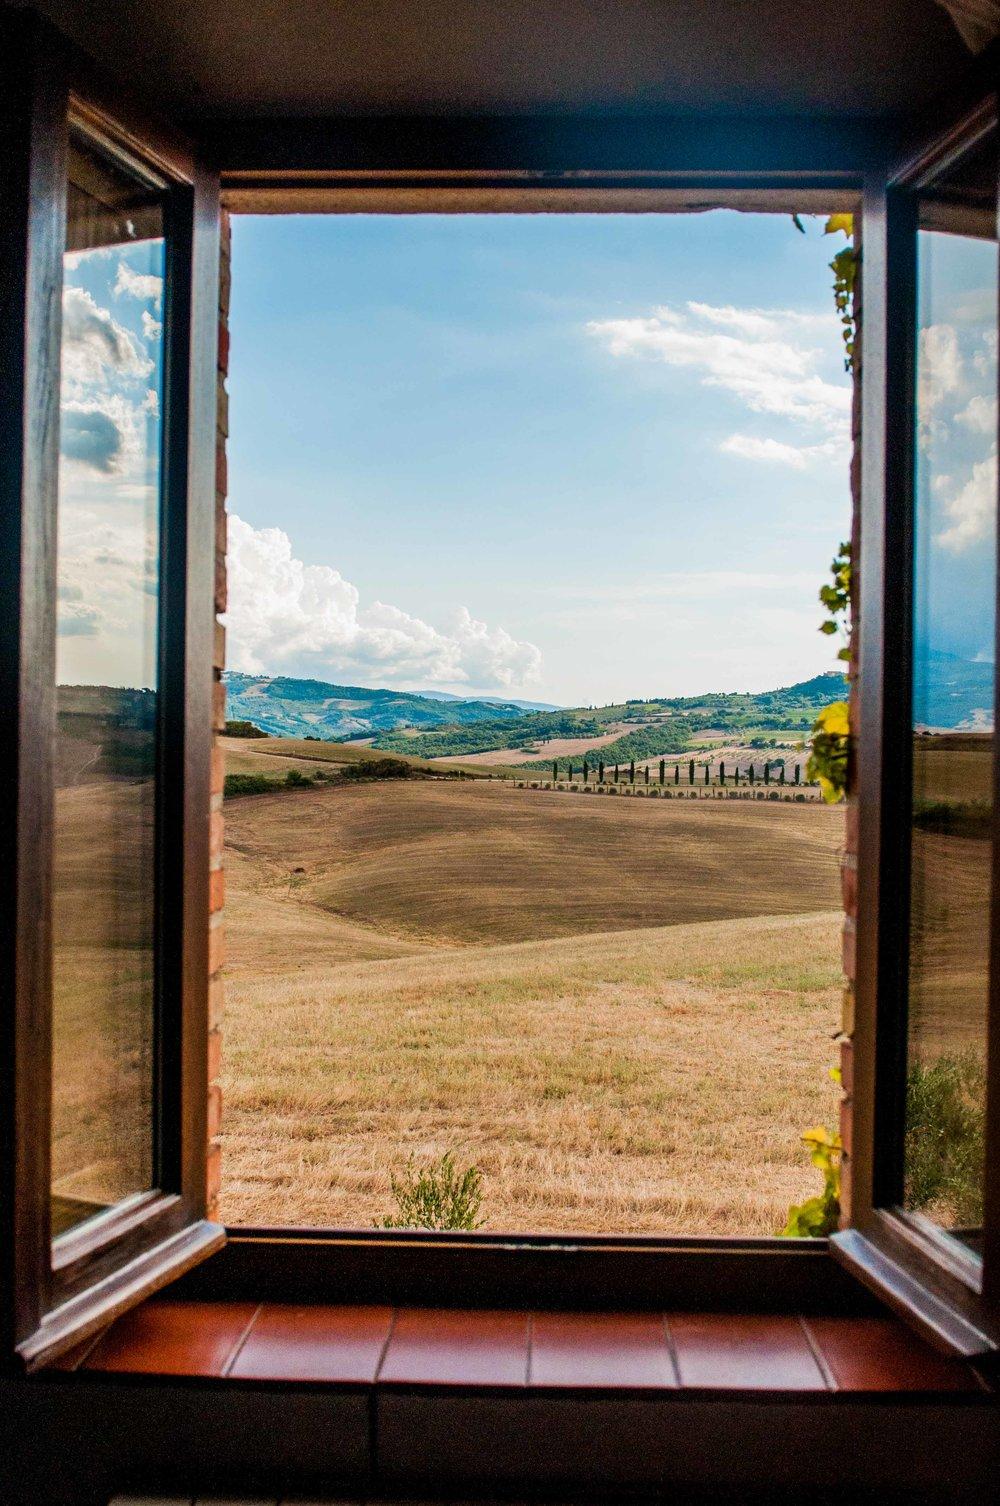 window-with-a-view-tuscany.jpg